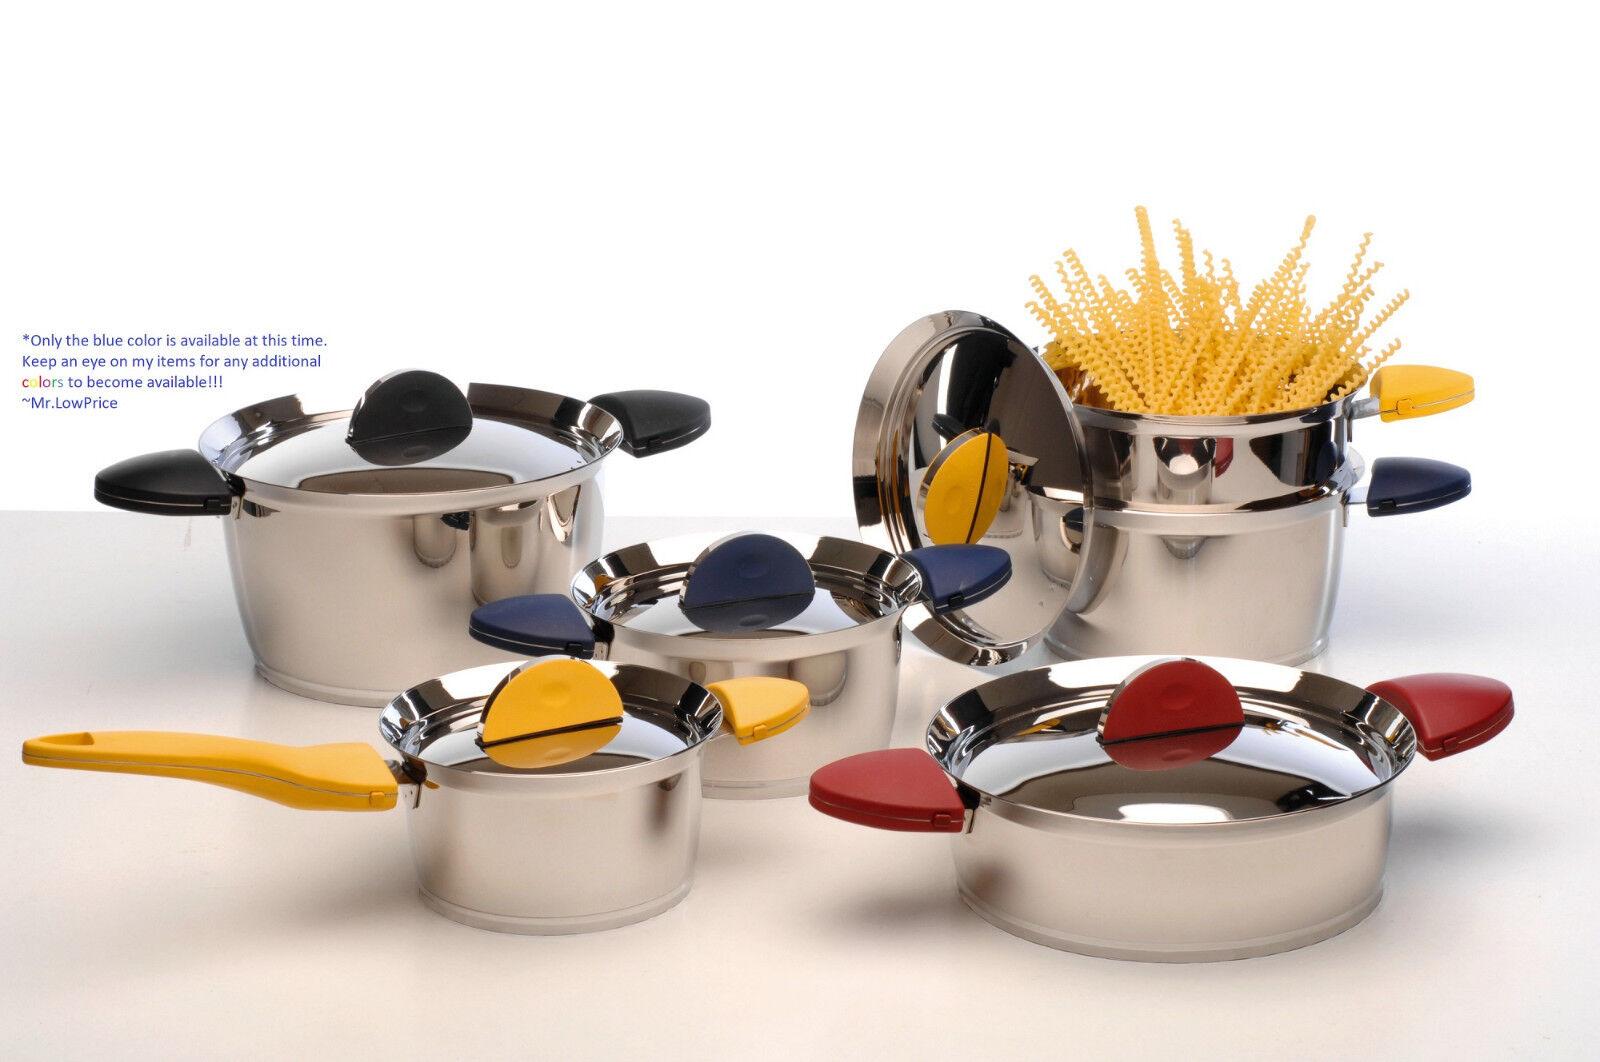 BergHOFF- Stacca 11-Piece Cookware Set- 1112527B